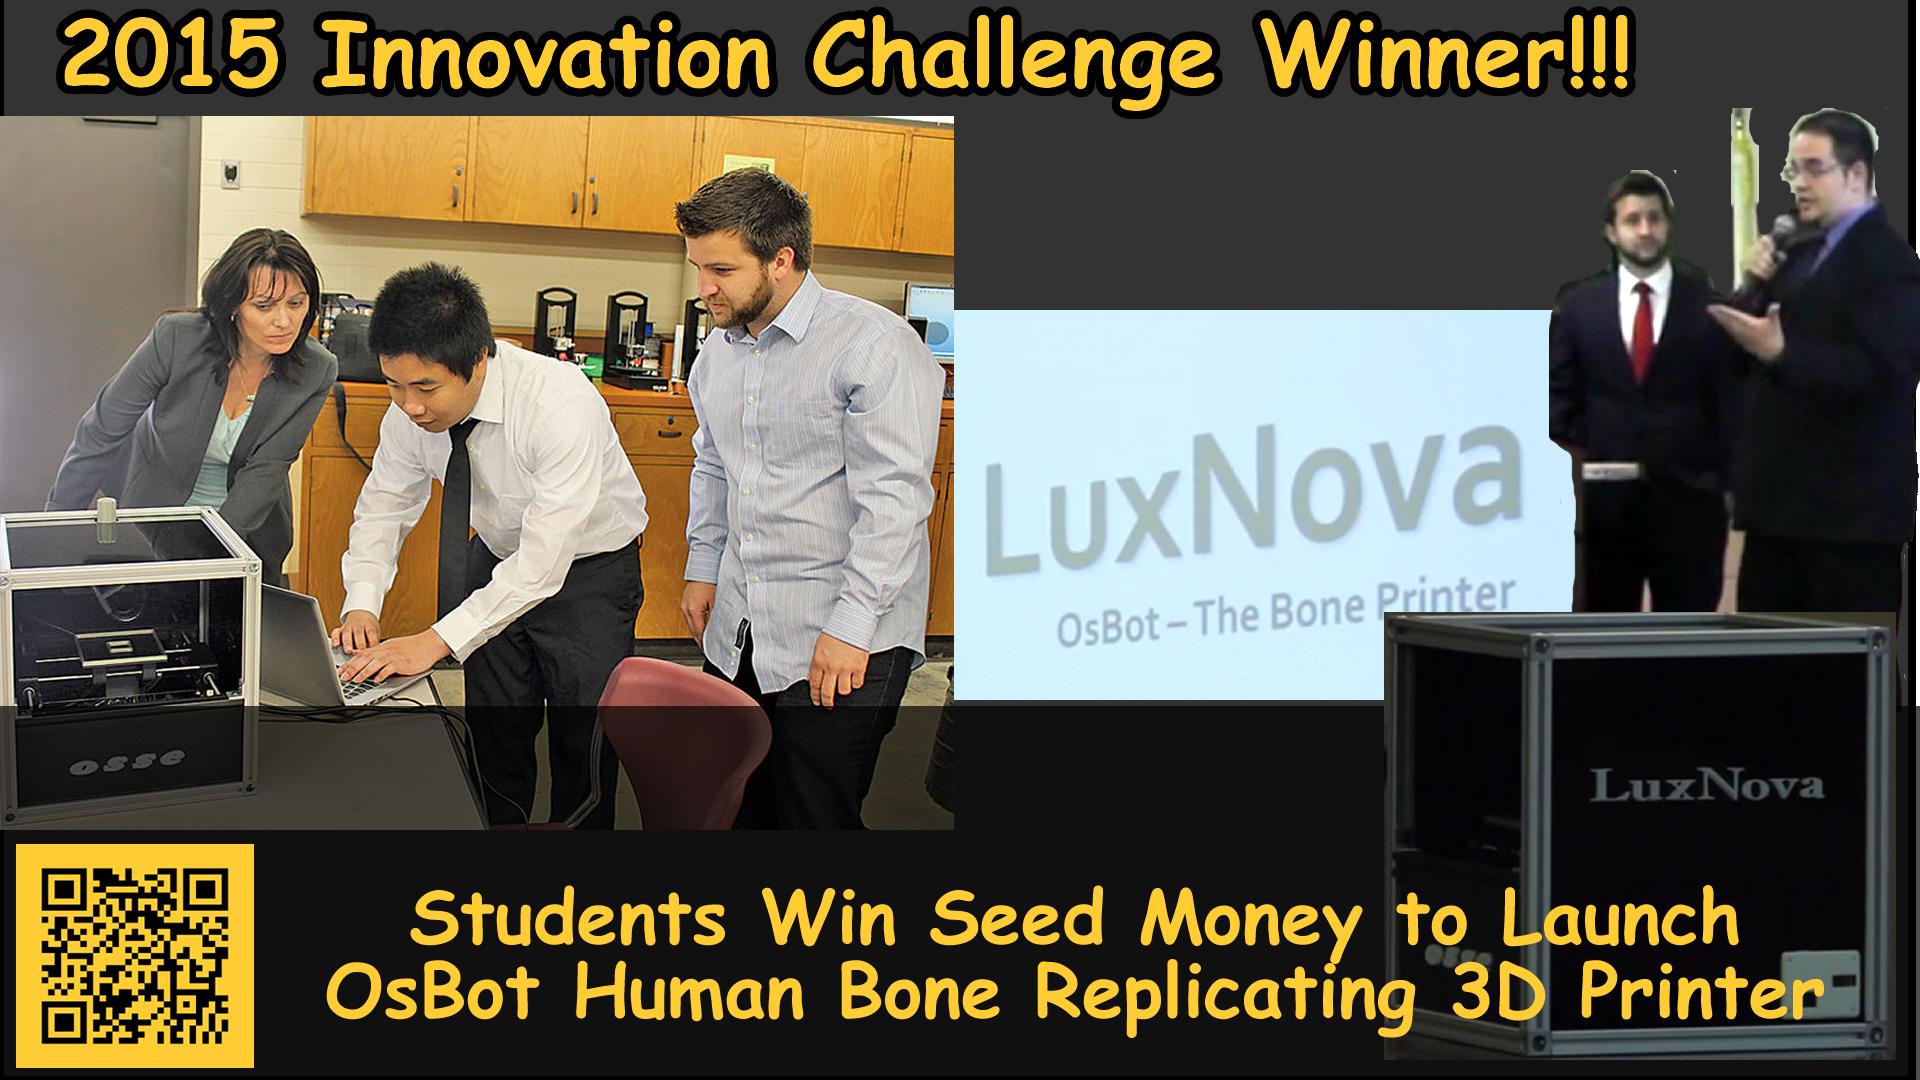 2015 Innovation Challenge Winners